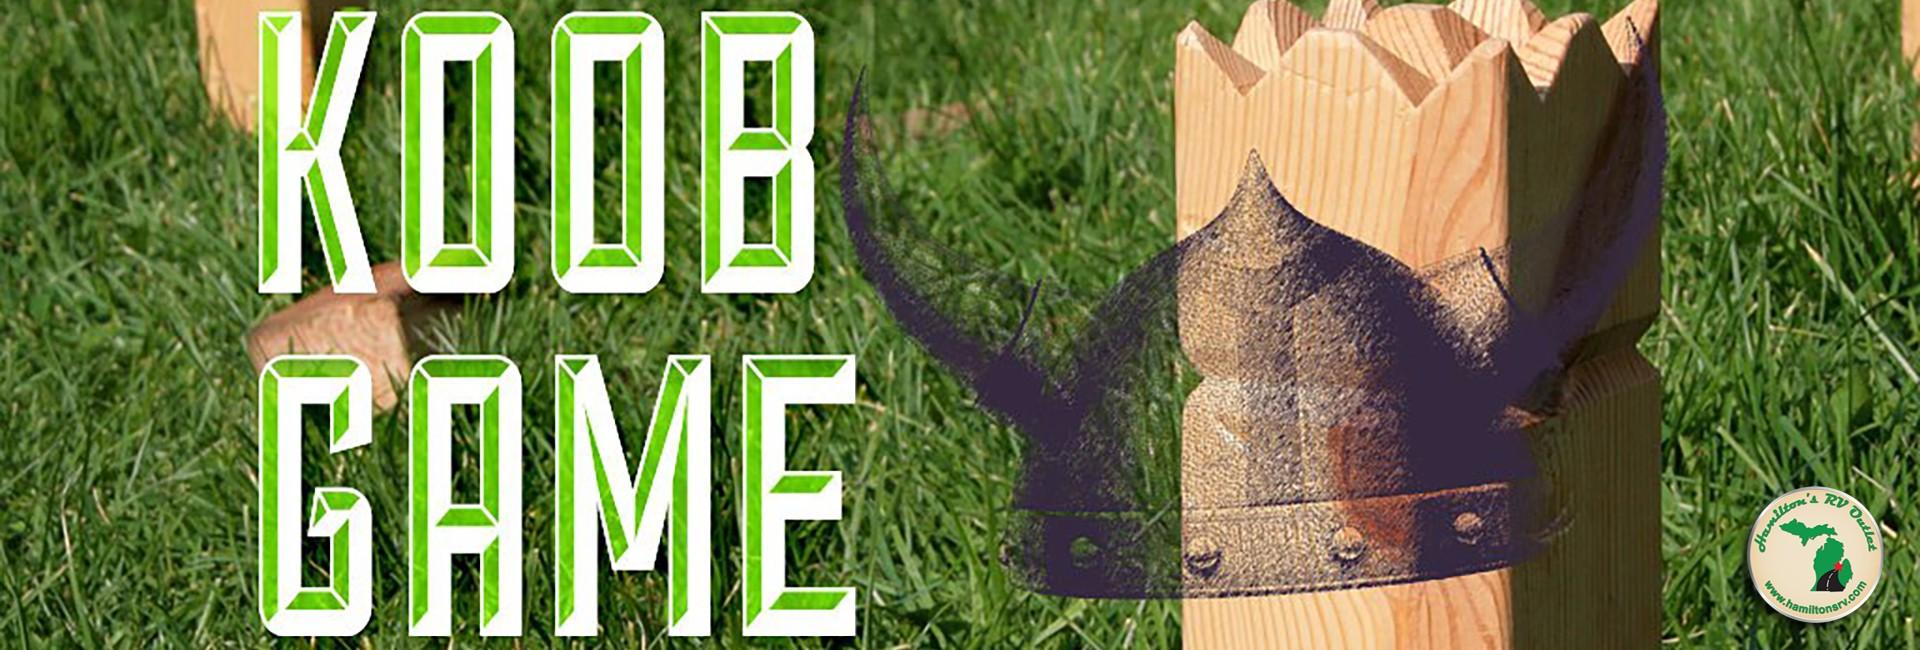 Koob Game - vikings Banner